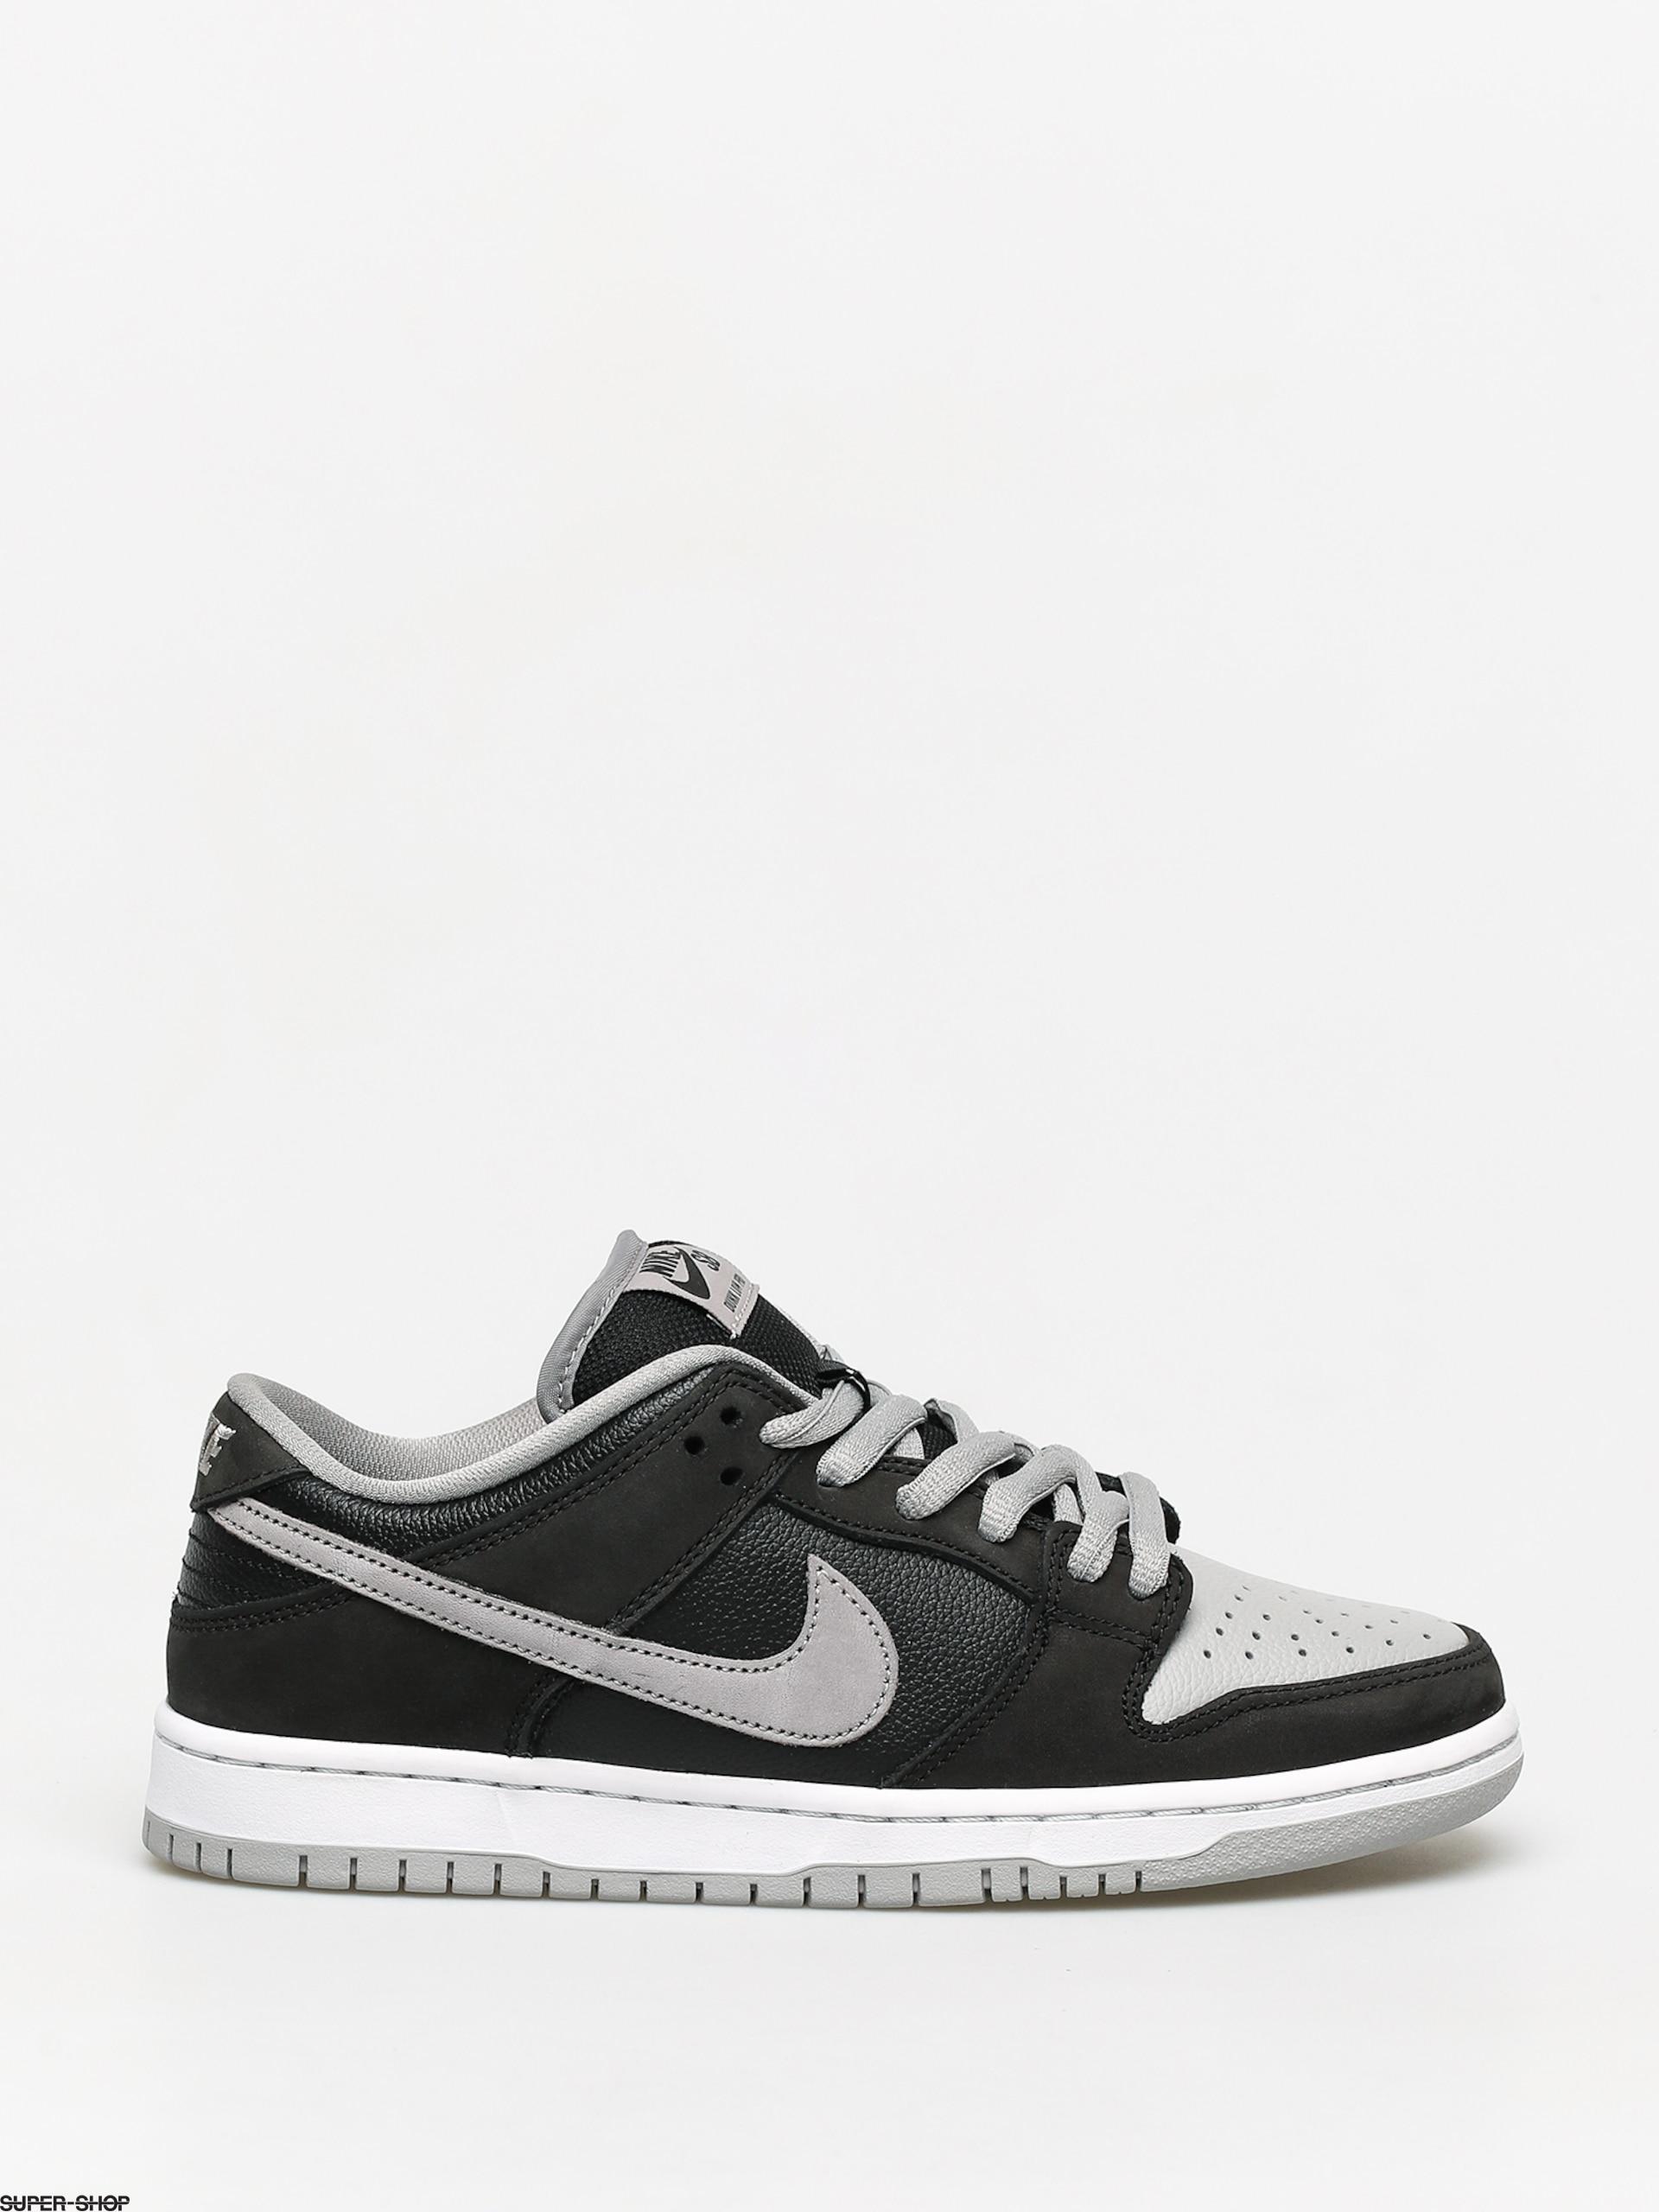 Nike SB Dunk Low Pro Shoes (black/medium grey black white)